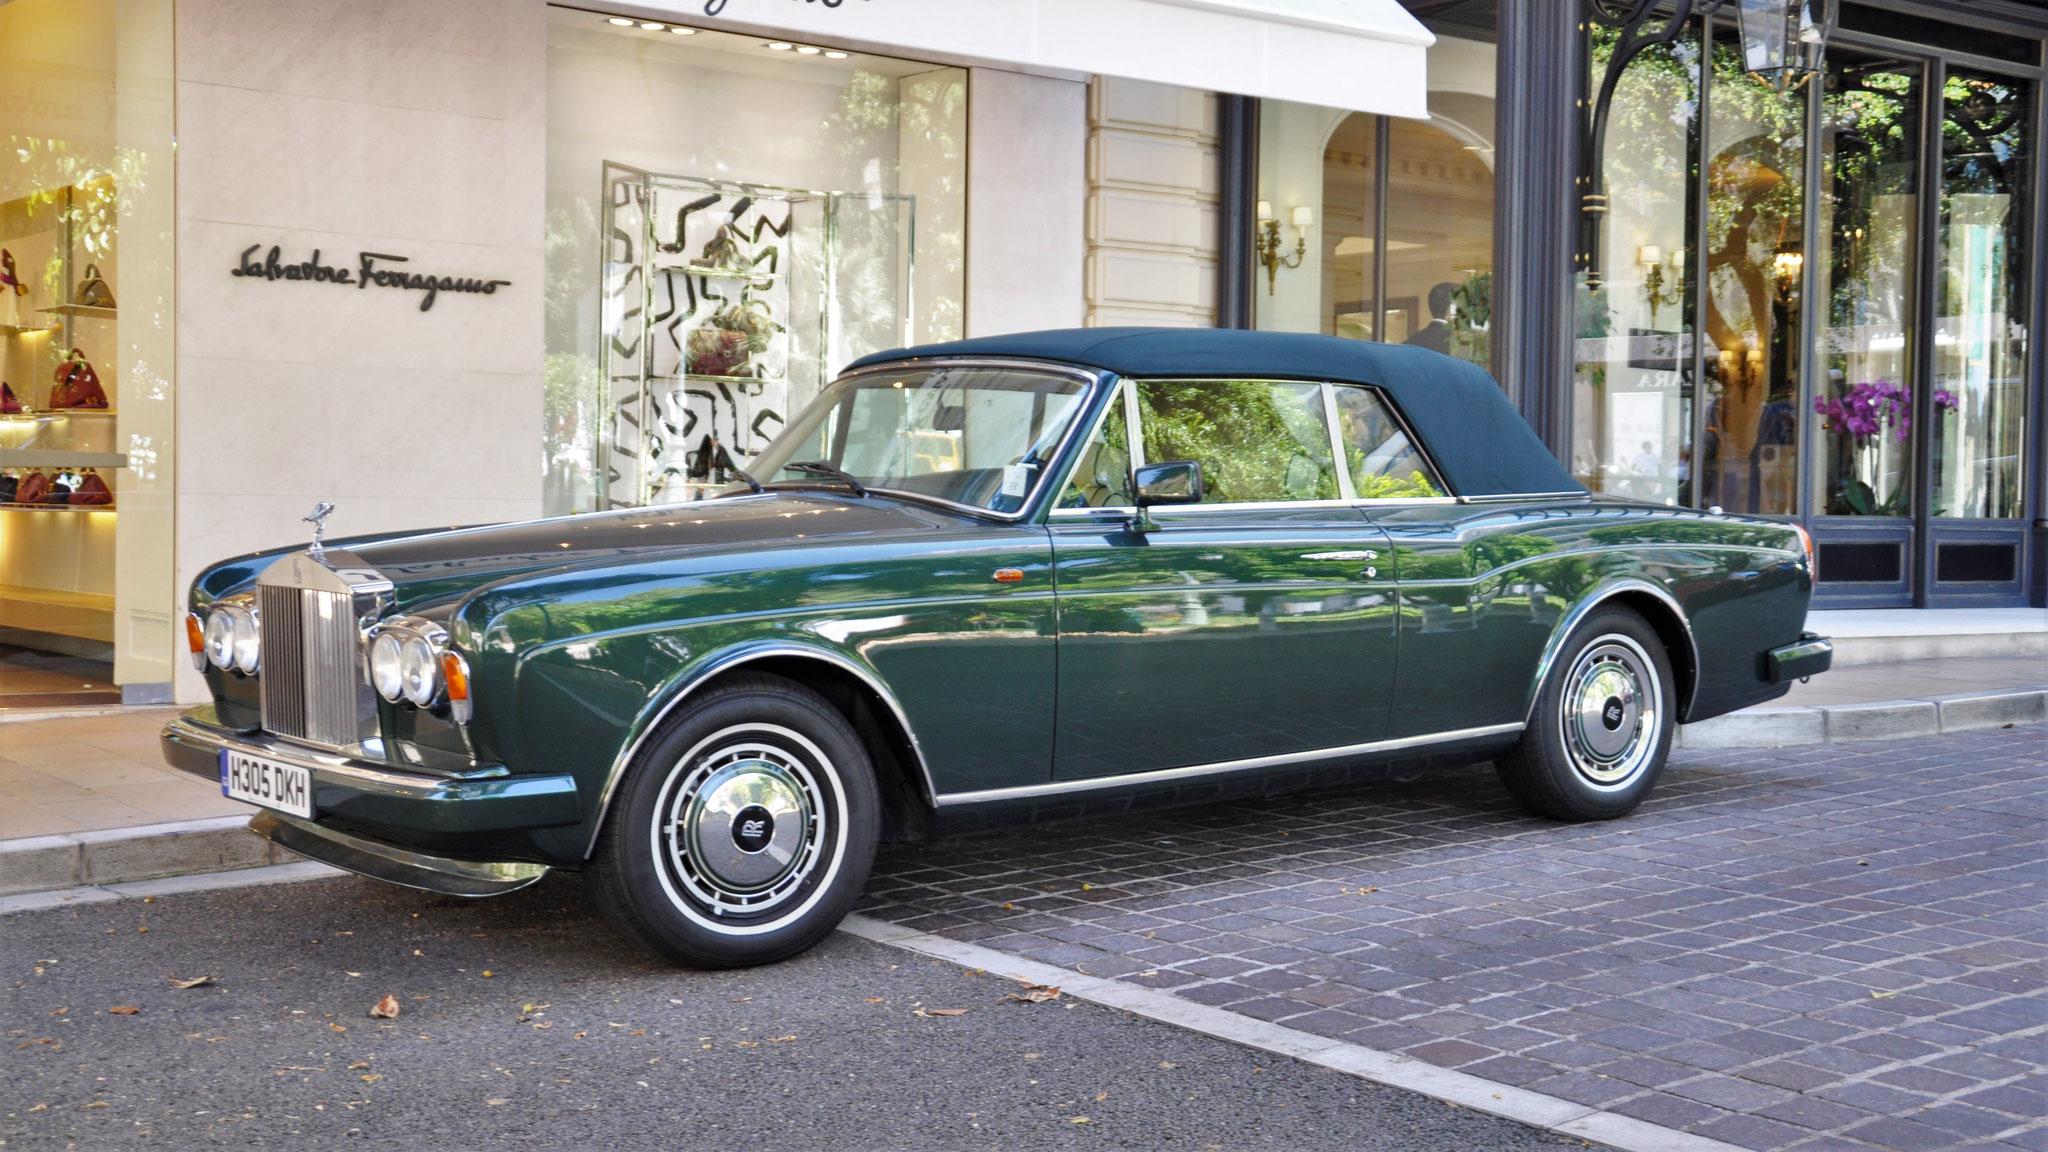 Rolls Royce Corniche - H305-DKH (GB)